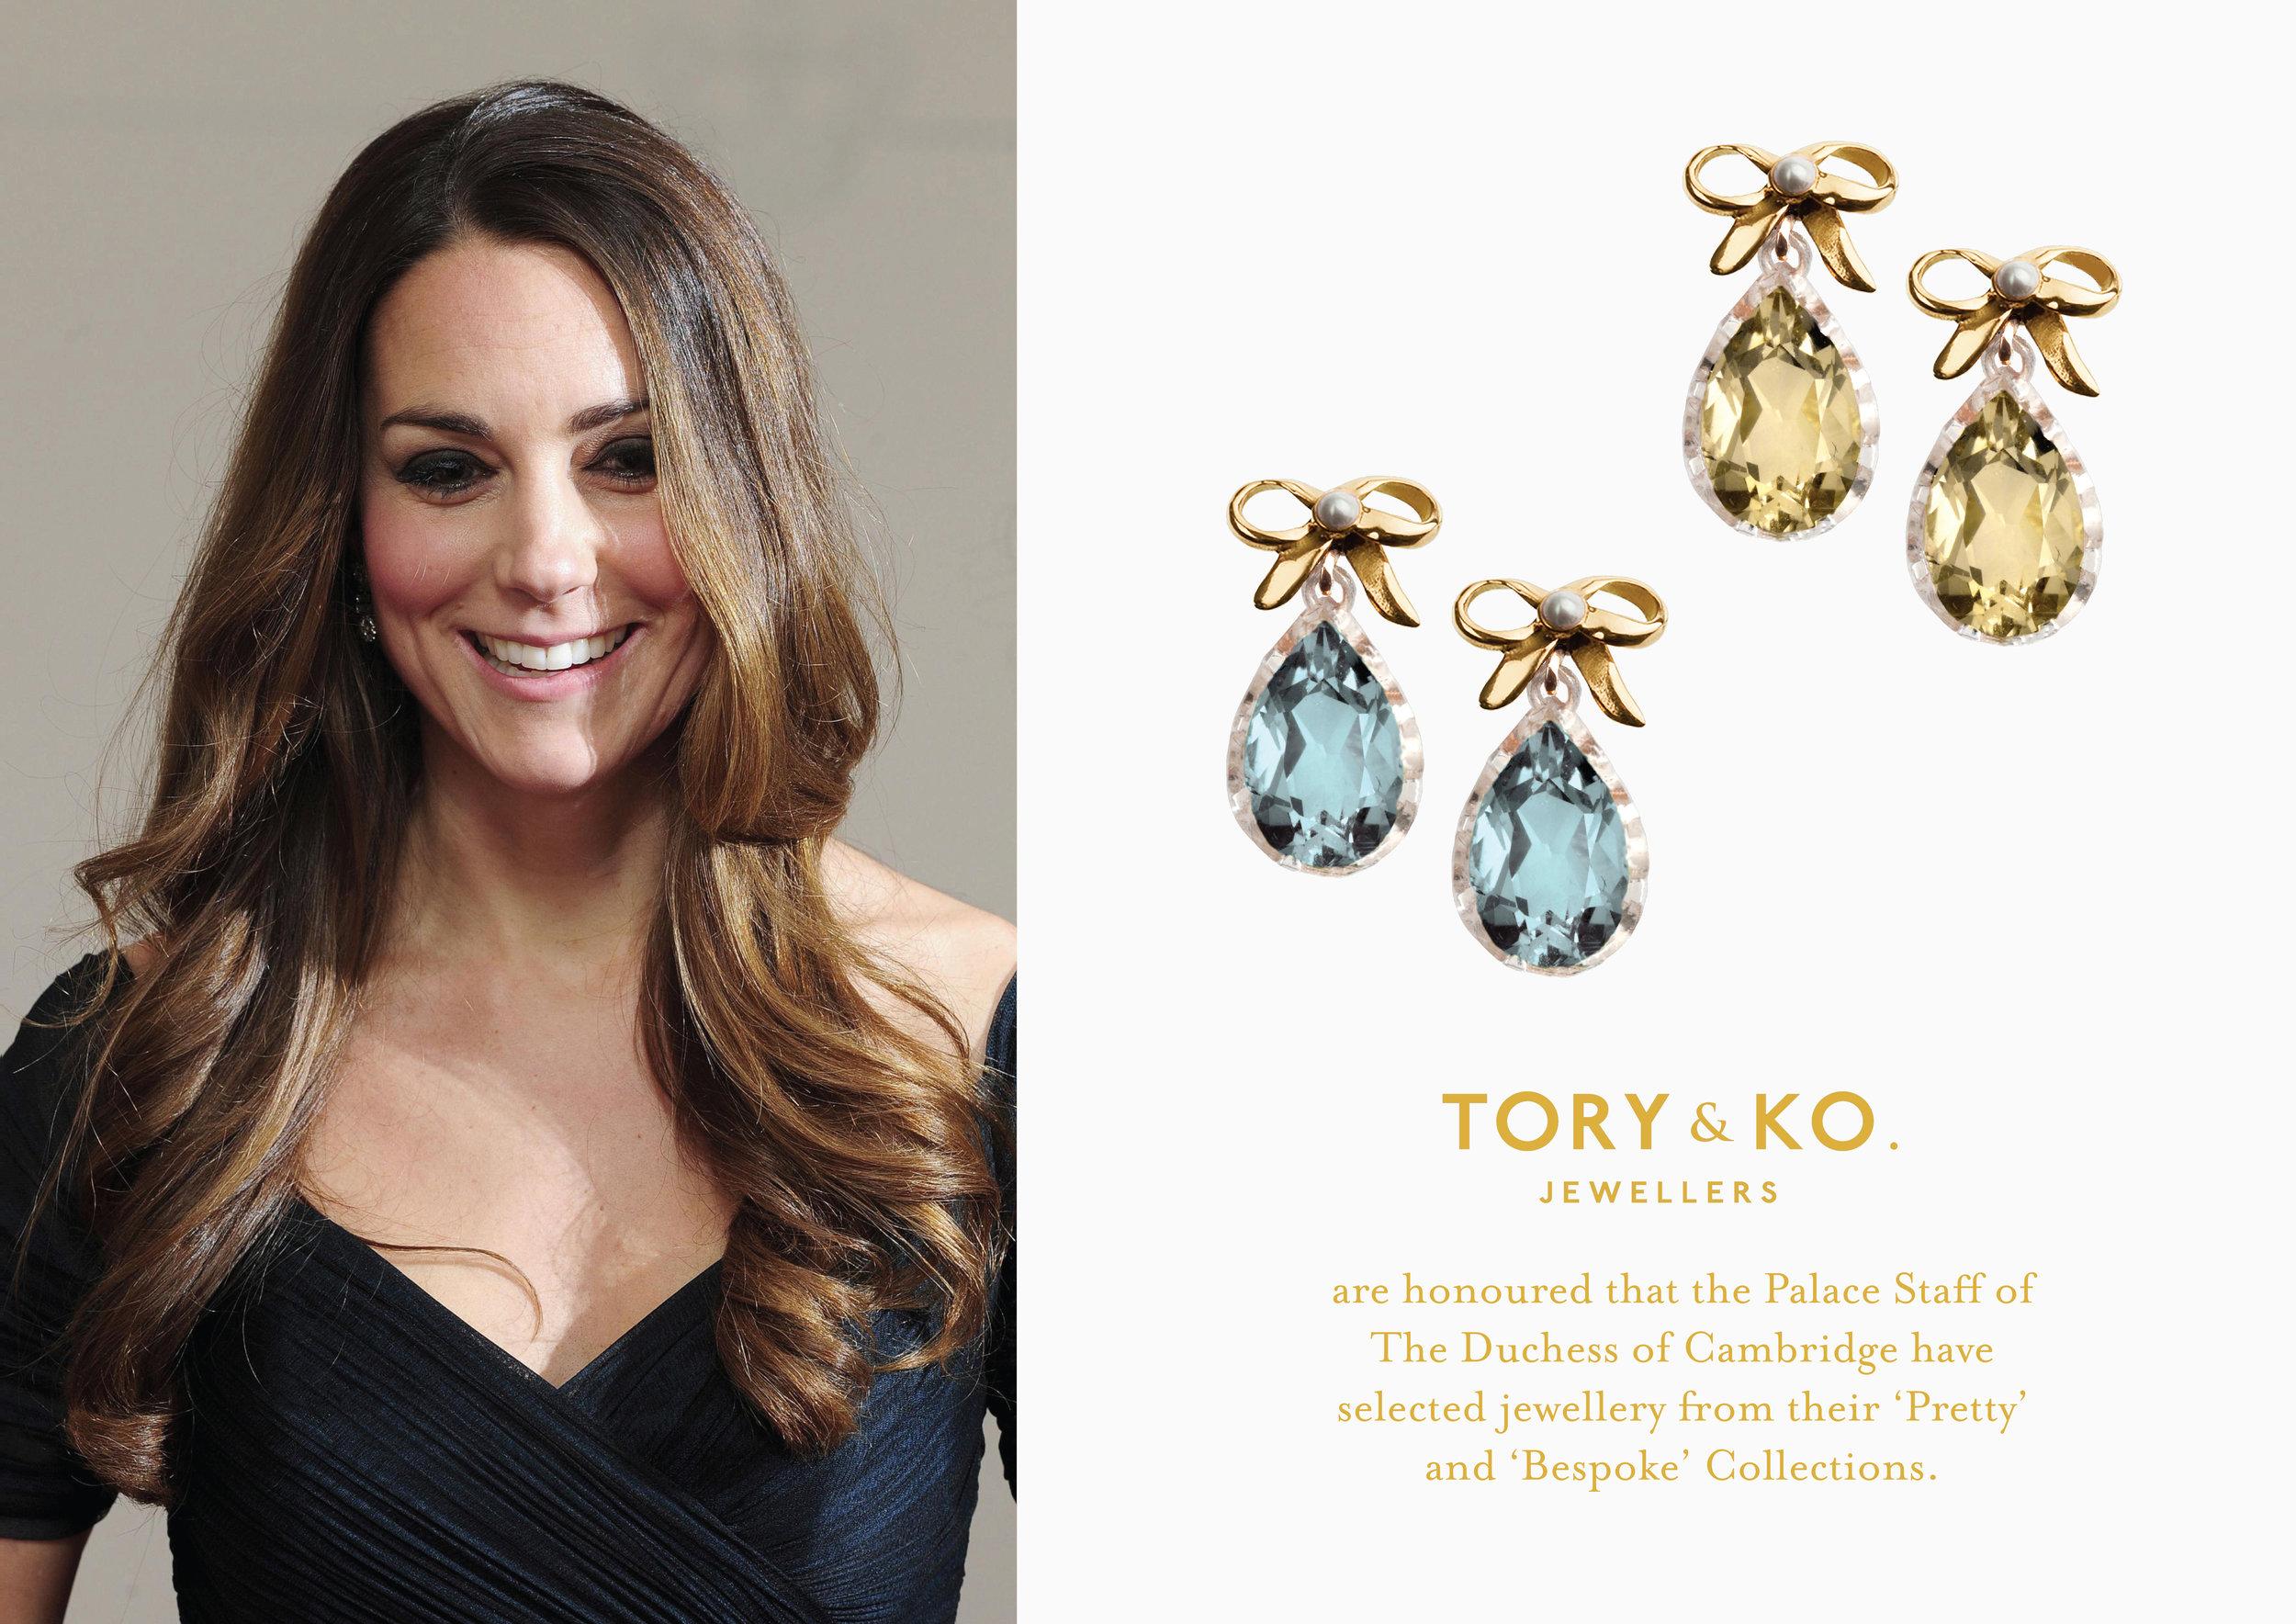 HRH Duchess of Cambridge Kate Middleton TORY & KO Pretty Collection earrings.jpg